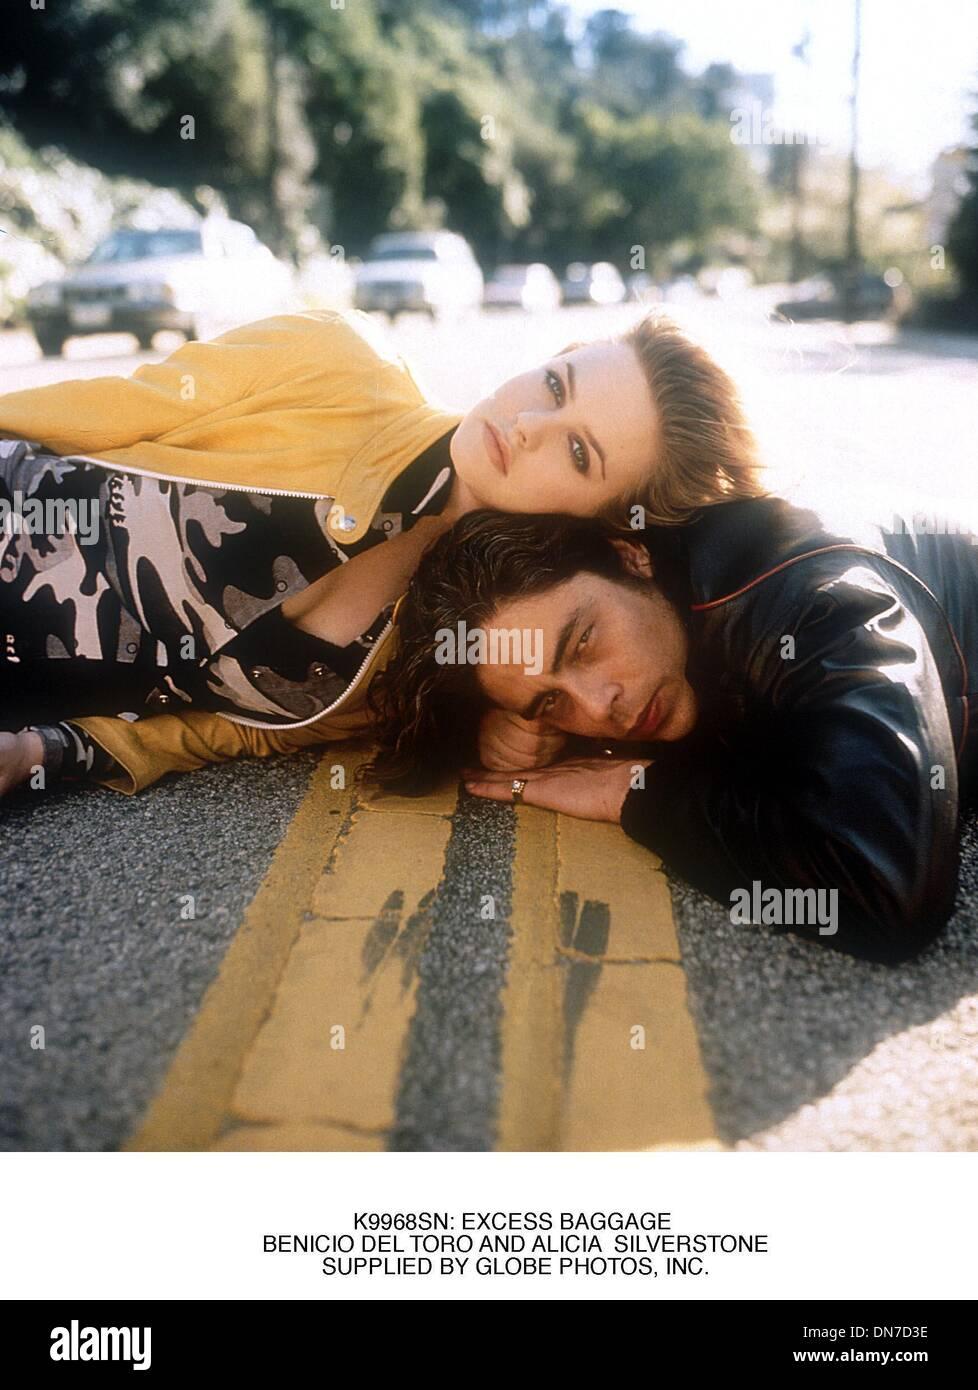 Jan. 16, 2001 - K9968SN: EXCESS BAGGAGE .BENICIO DEL TORO AND ALICIA  SILVERSTONE.SUPPLIED BY (Credit Image: © Globe Photos/ZUMAPRESS.com) - Stock Image